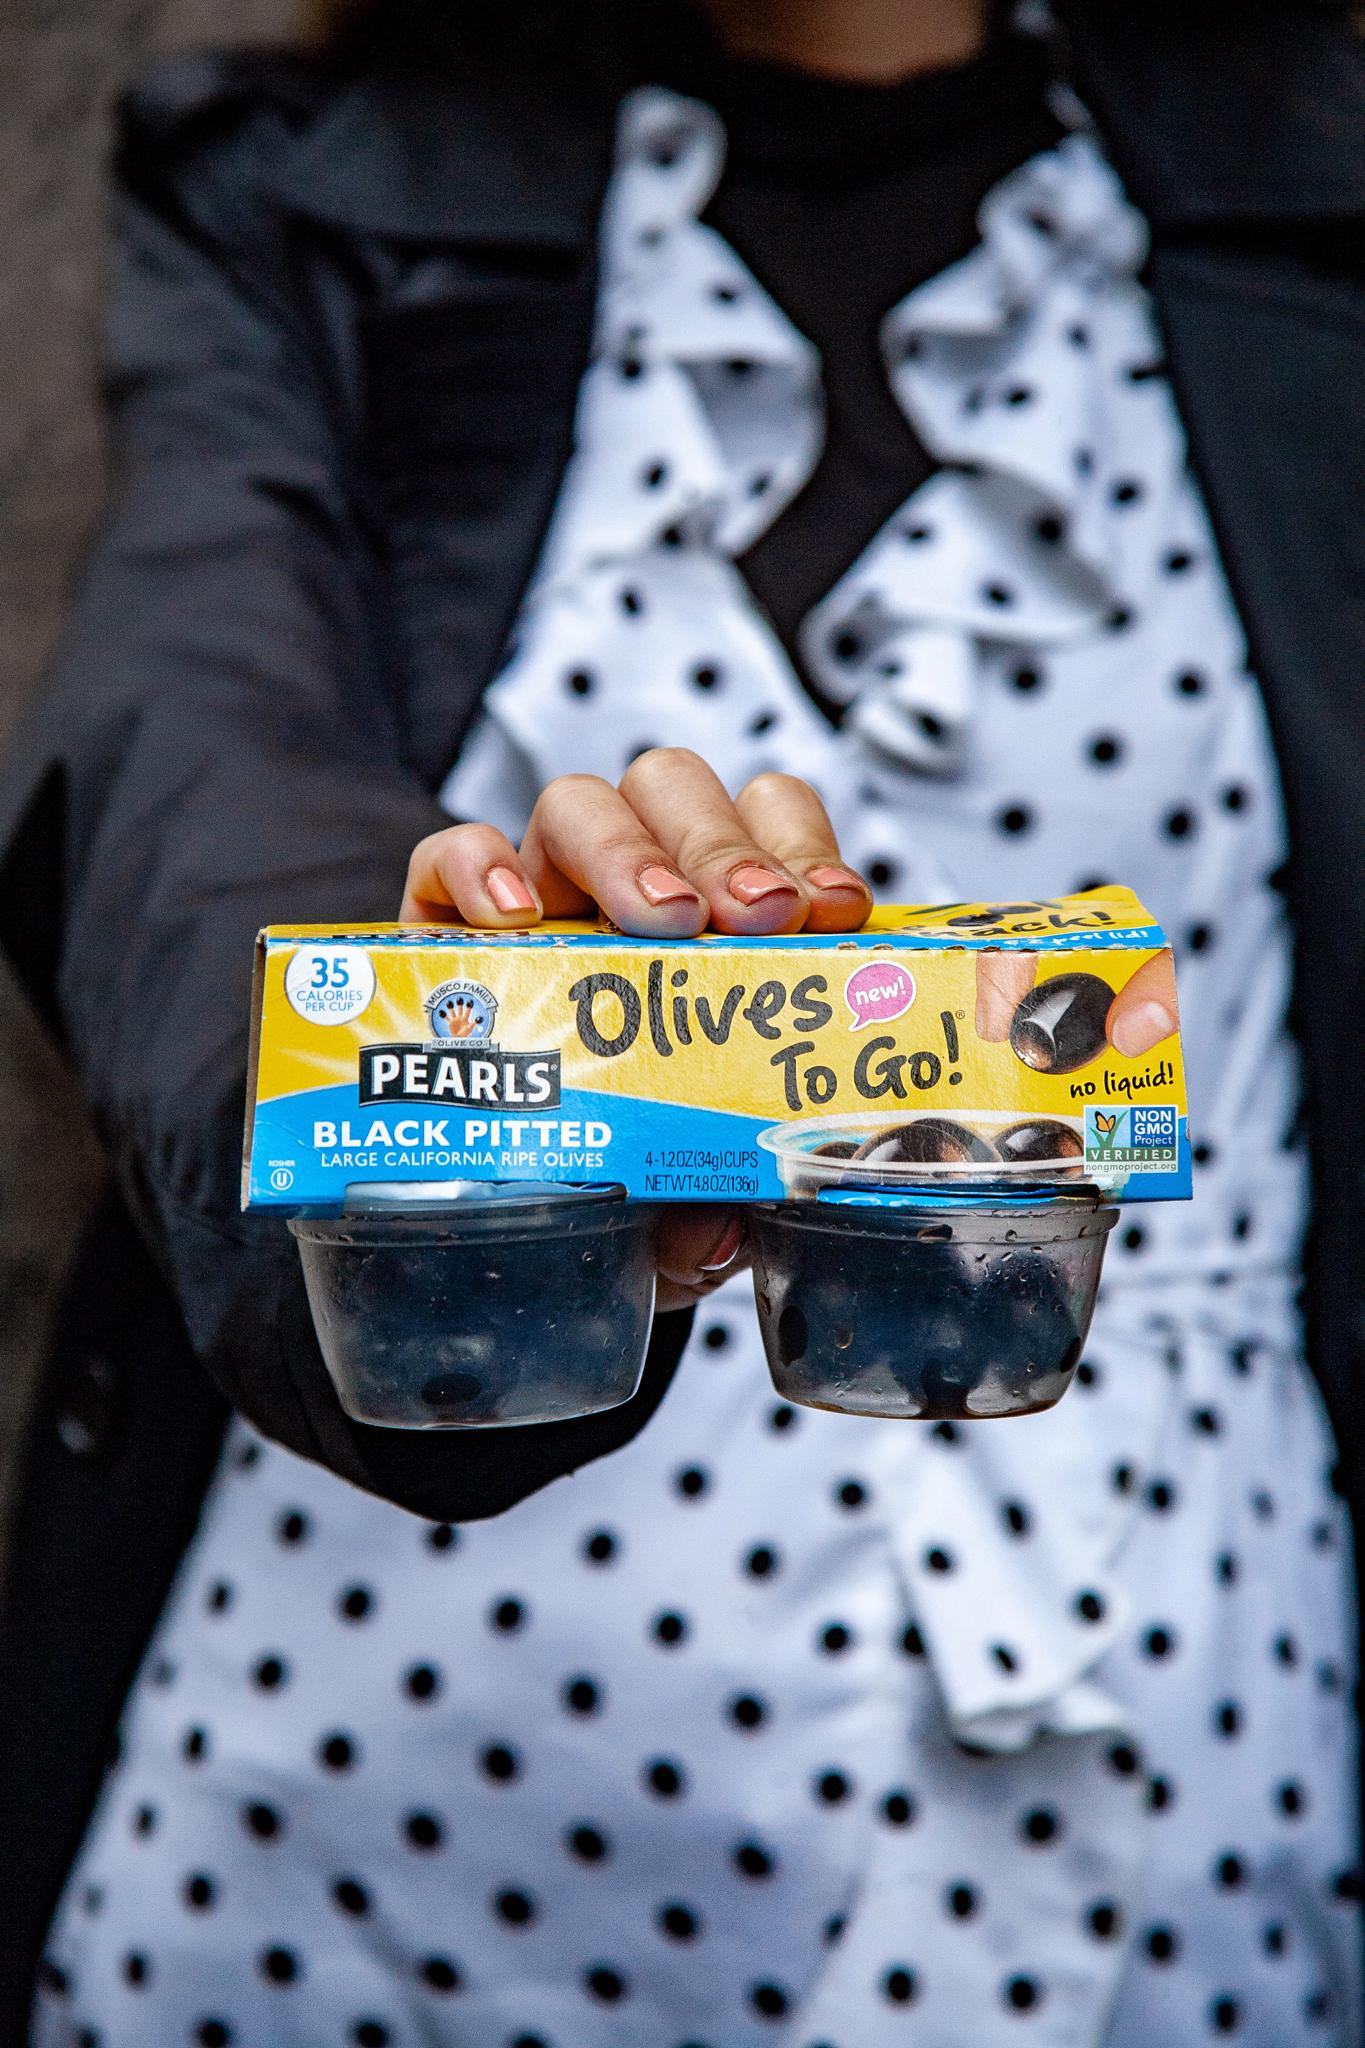 Pearls Olives!®